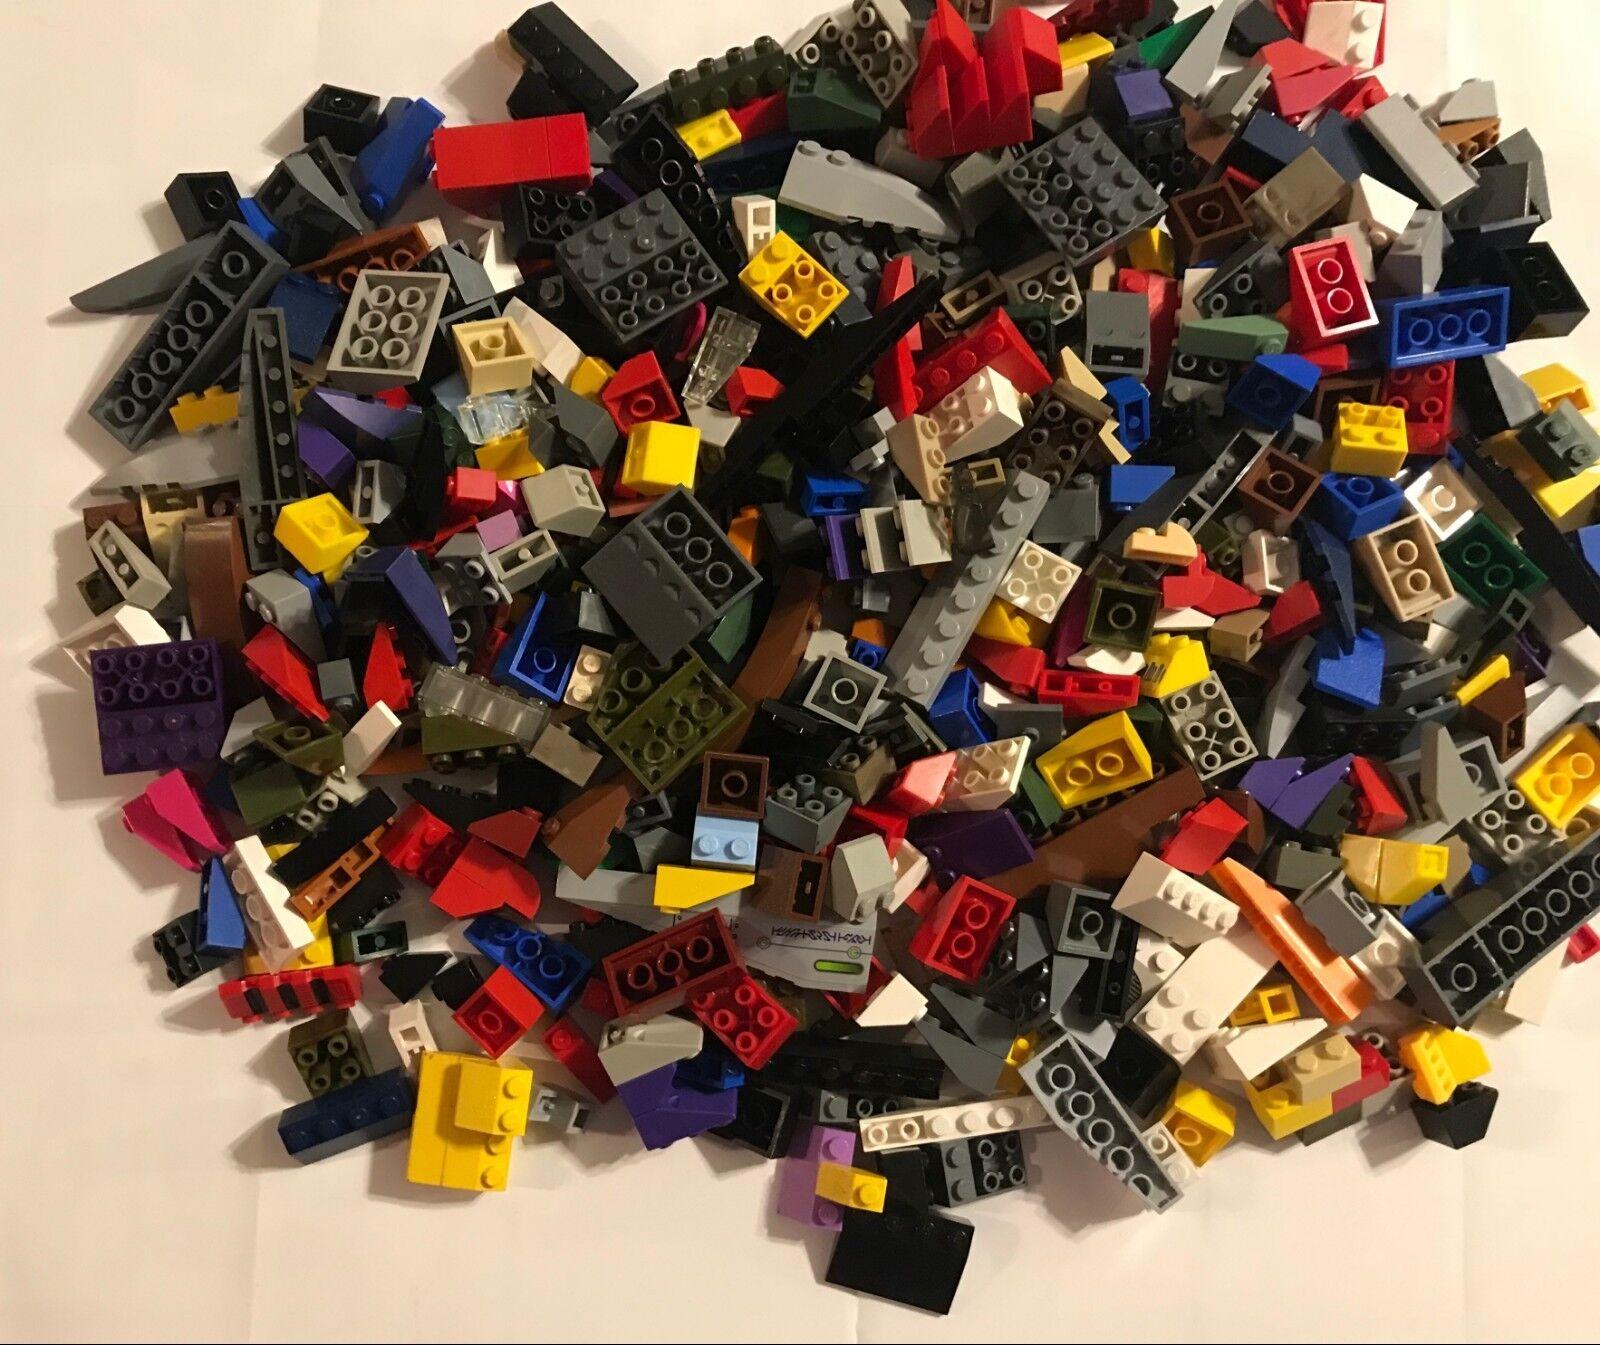 LEGO CITY CITY CITY - SKYSCRAPER  RARE RETIRED SET - USED 2ca608